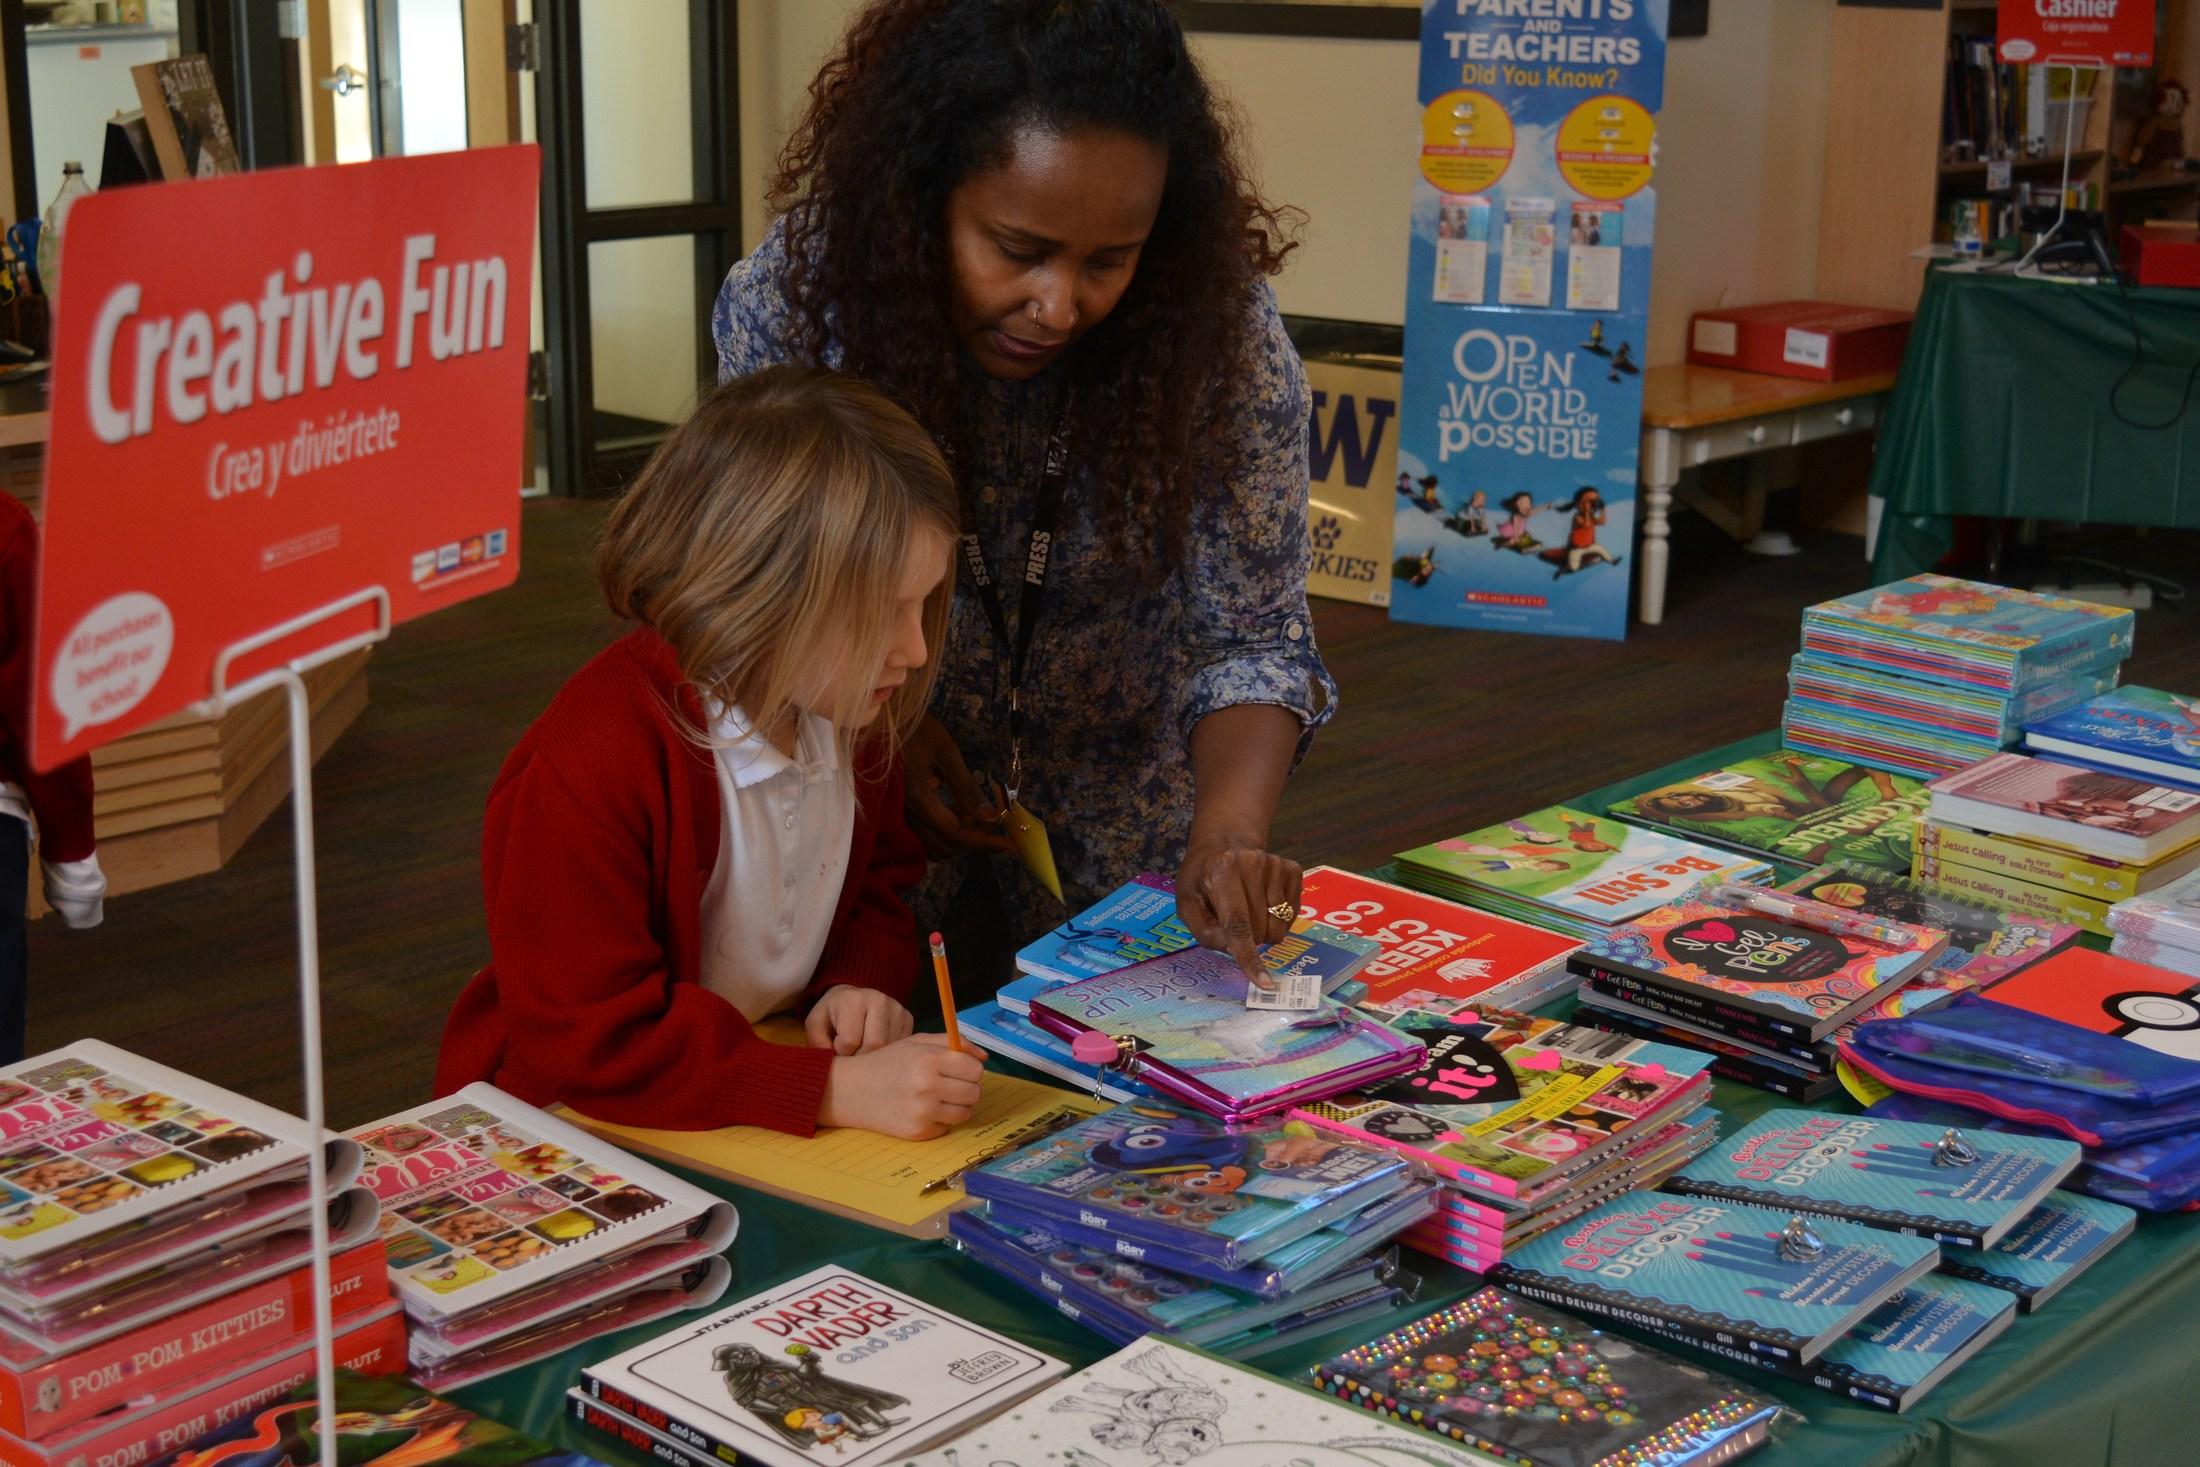 Parent volunteer helping student at book fair